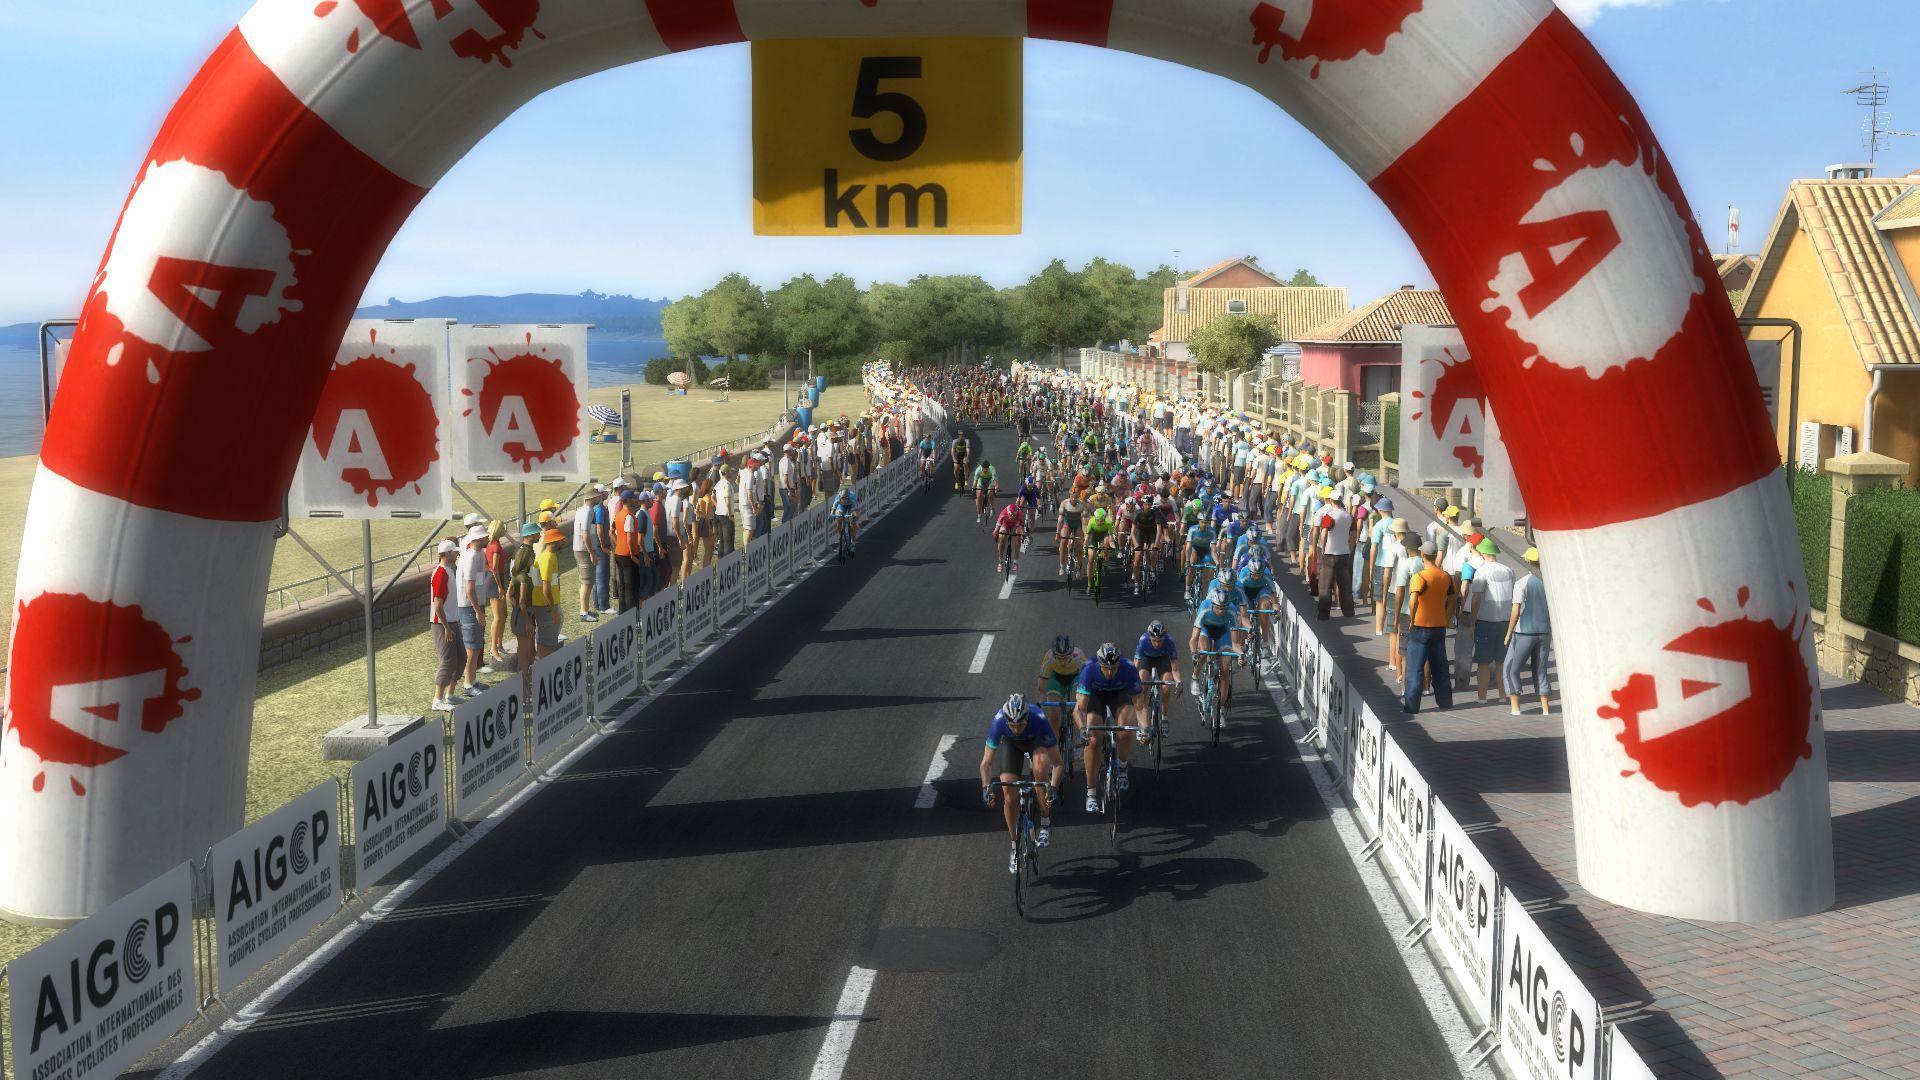 pcmdaily.com/images/mg/2019/Races/PT/Tirreno/mg19_ta_s07_18.jpg